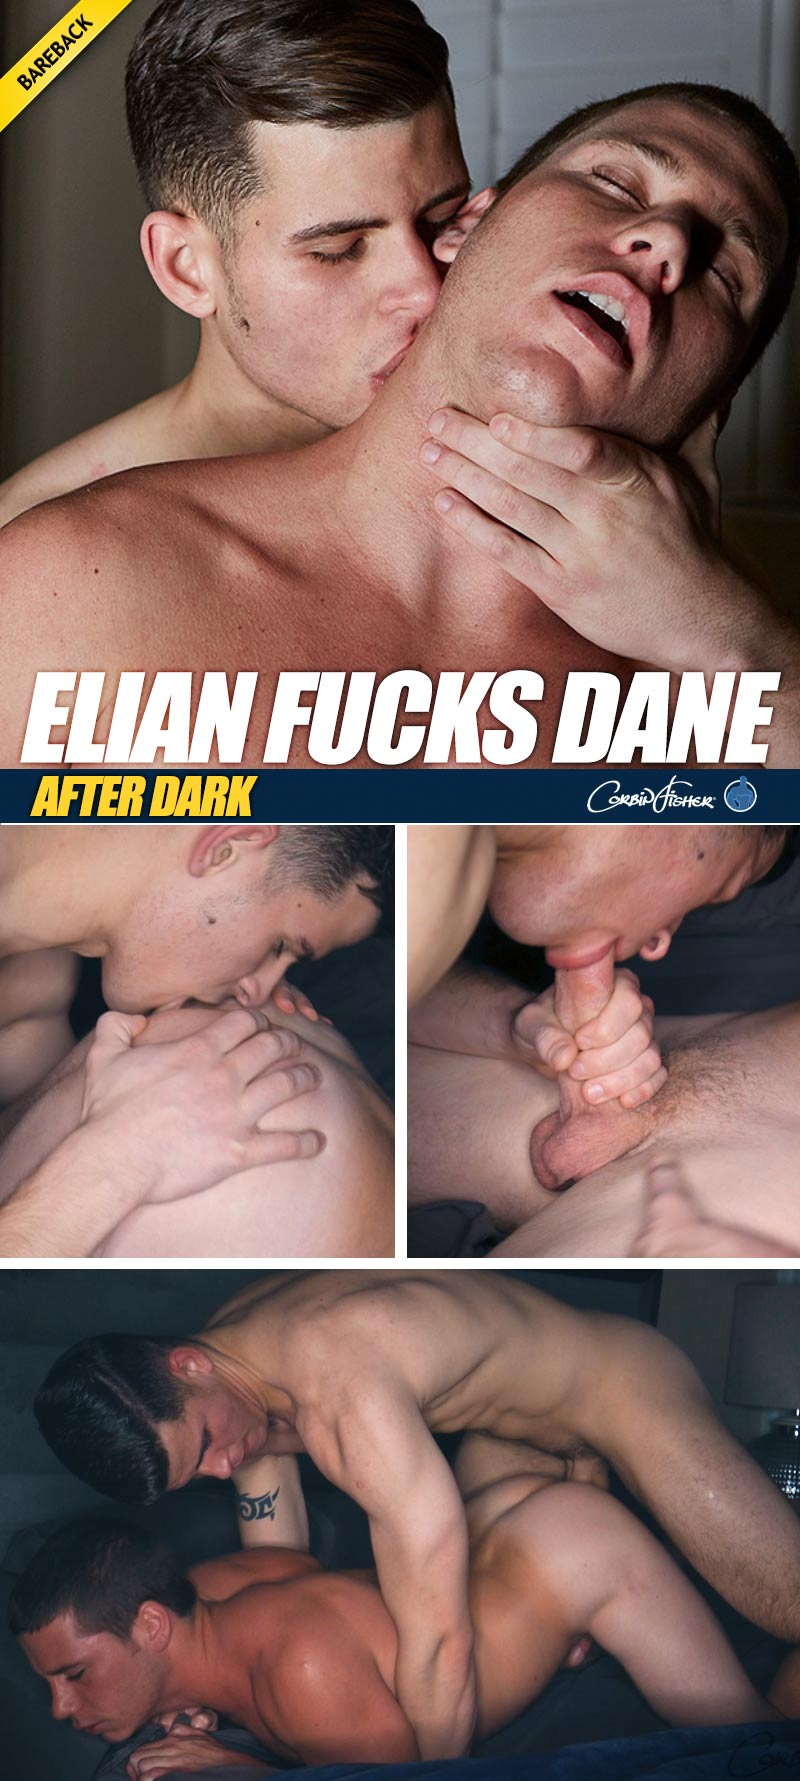 Elian Fucks Dane 'After Dark' (Bareback) at CorbinFisher